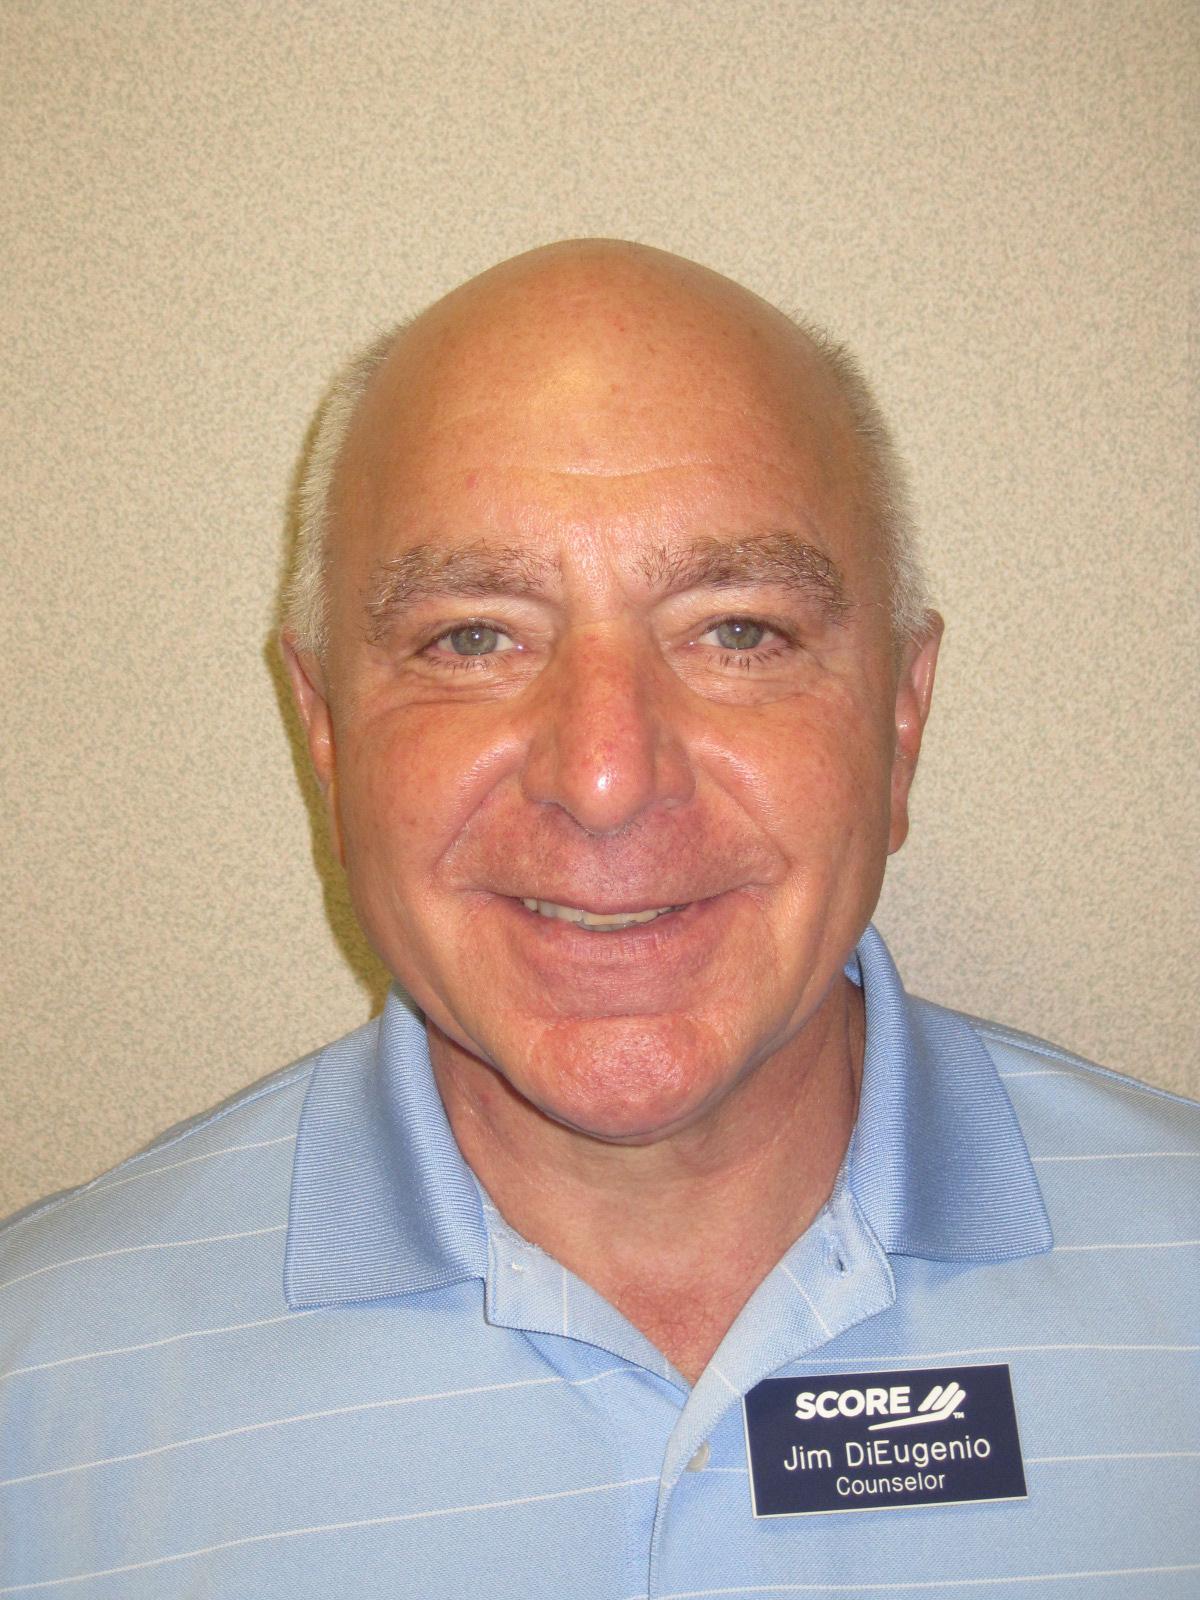 Jim DiEugenio